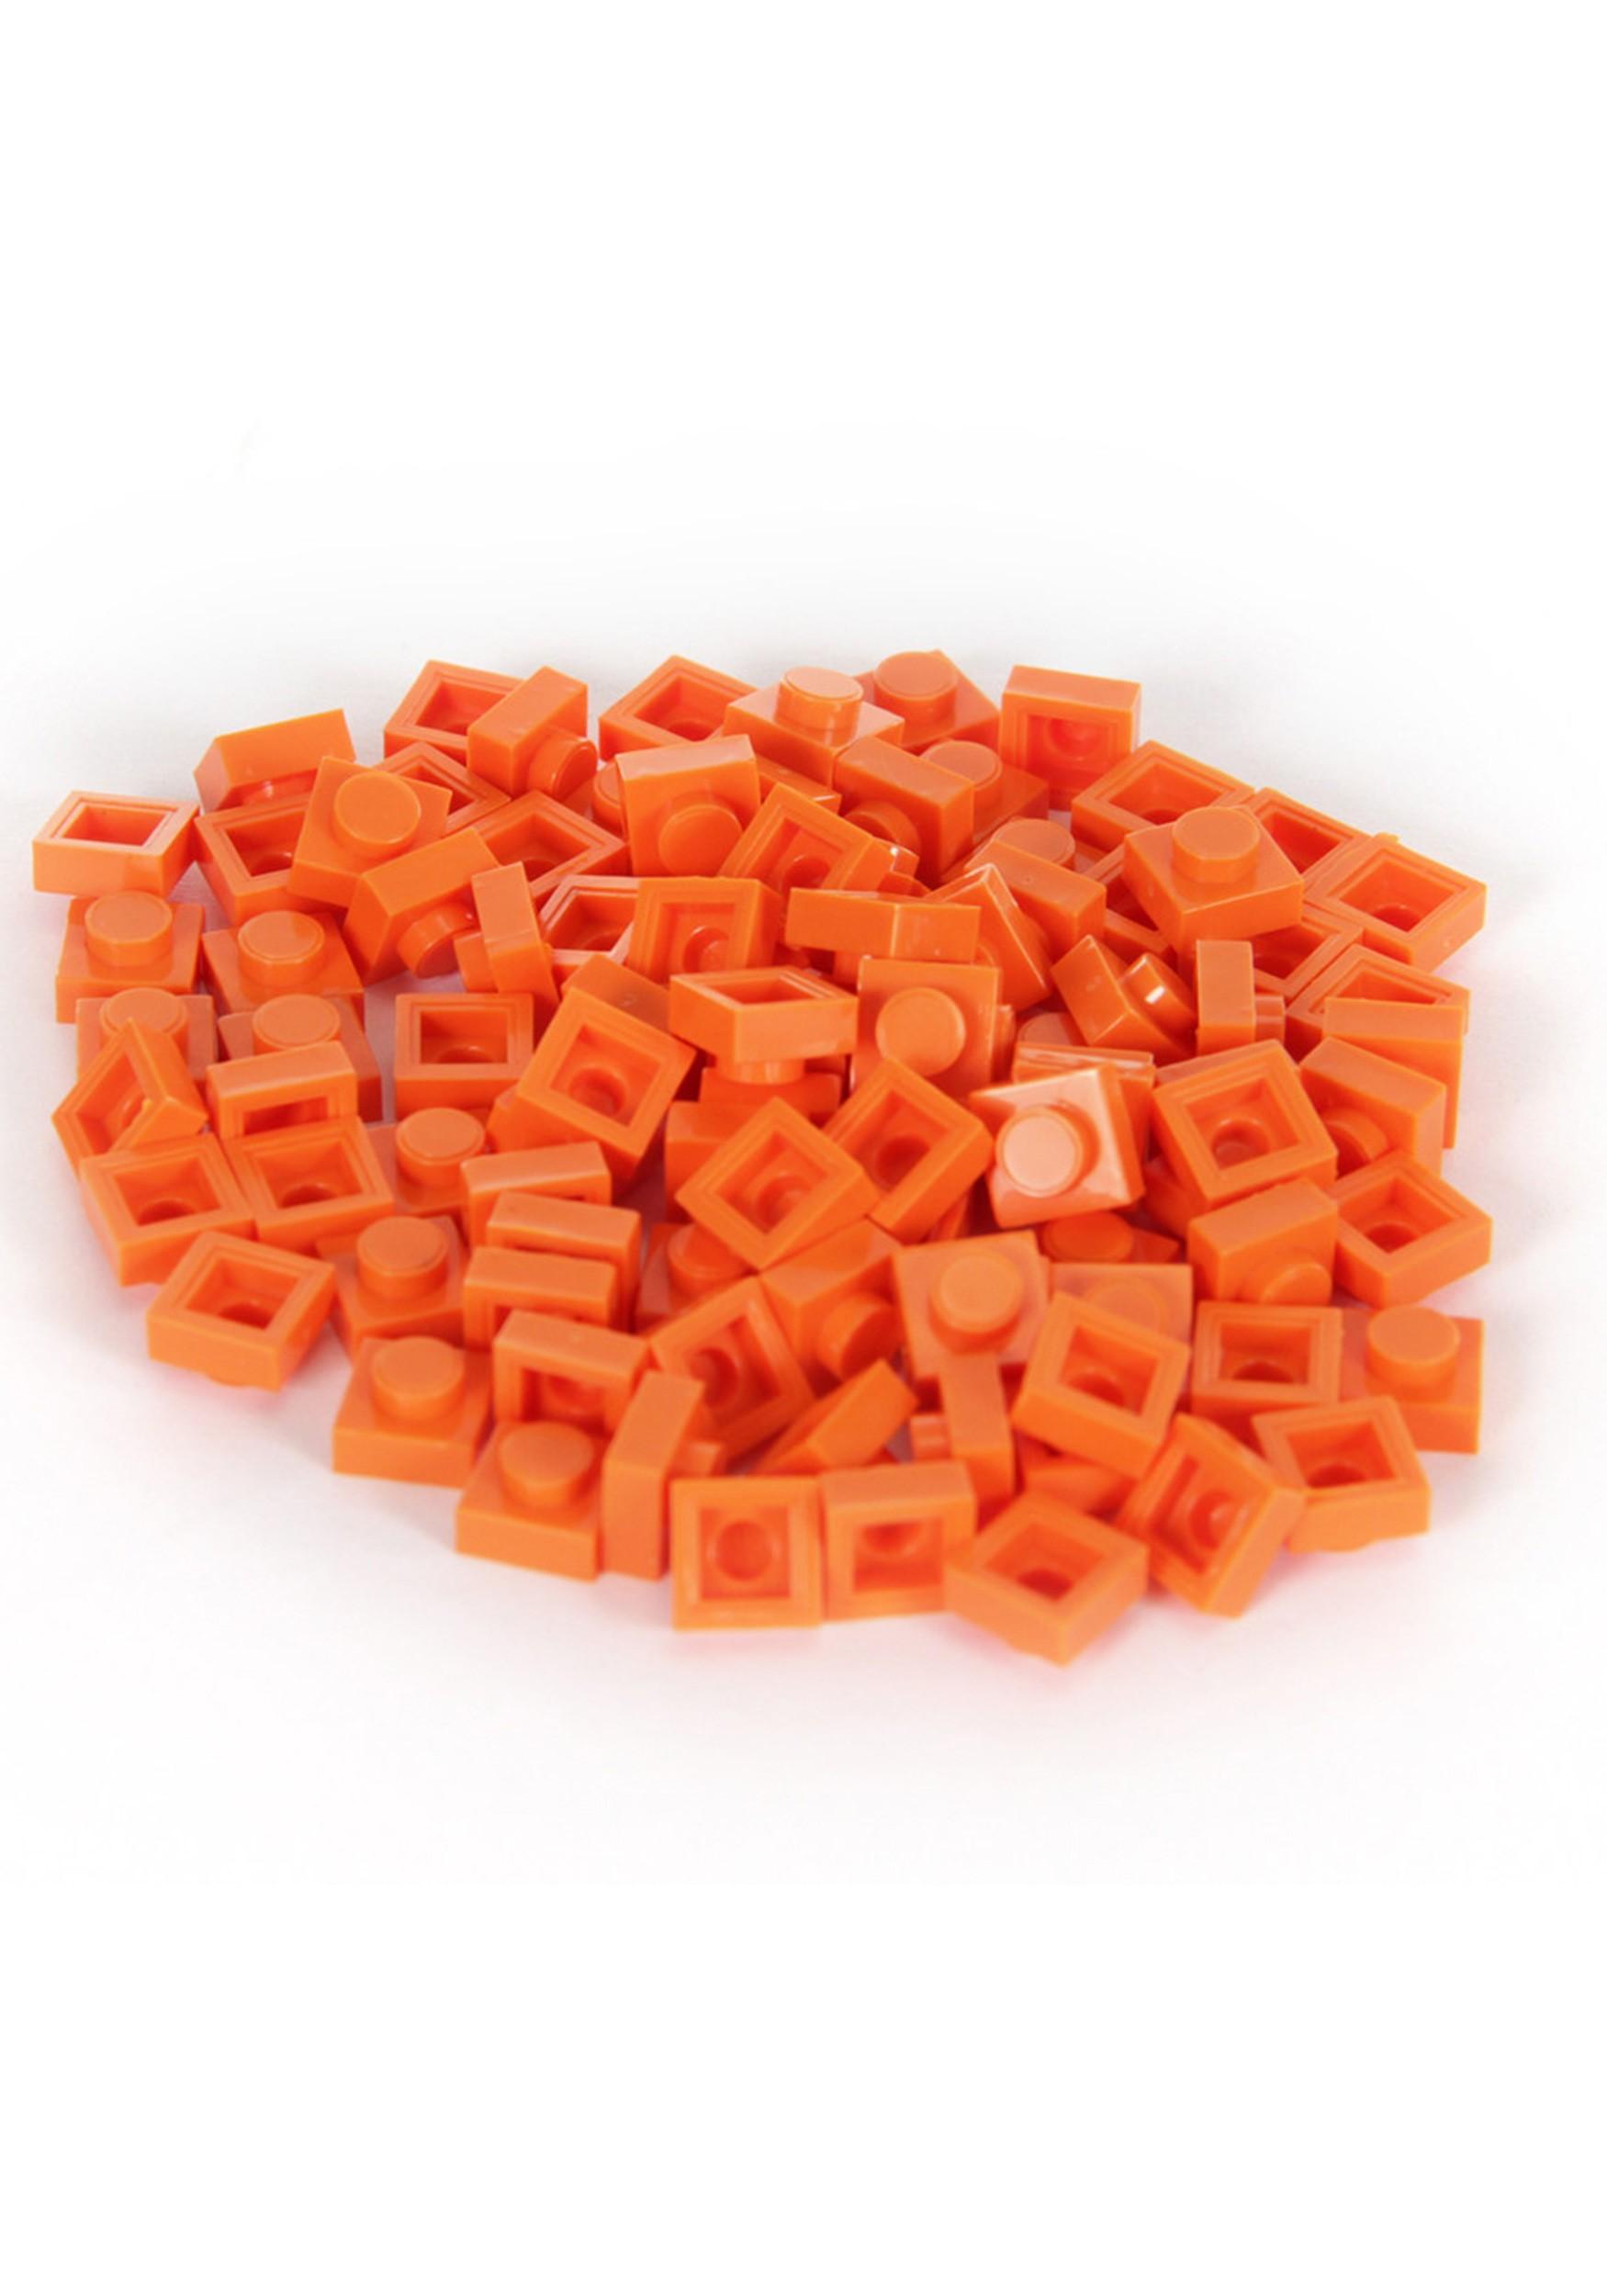 Orange Bricky Blocks 100 Pieces 1x1